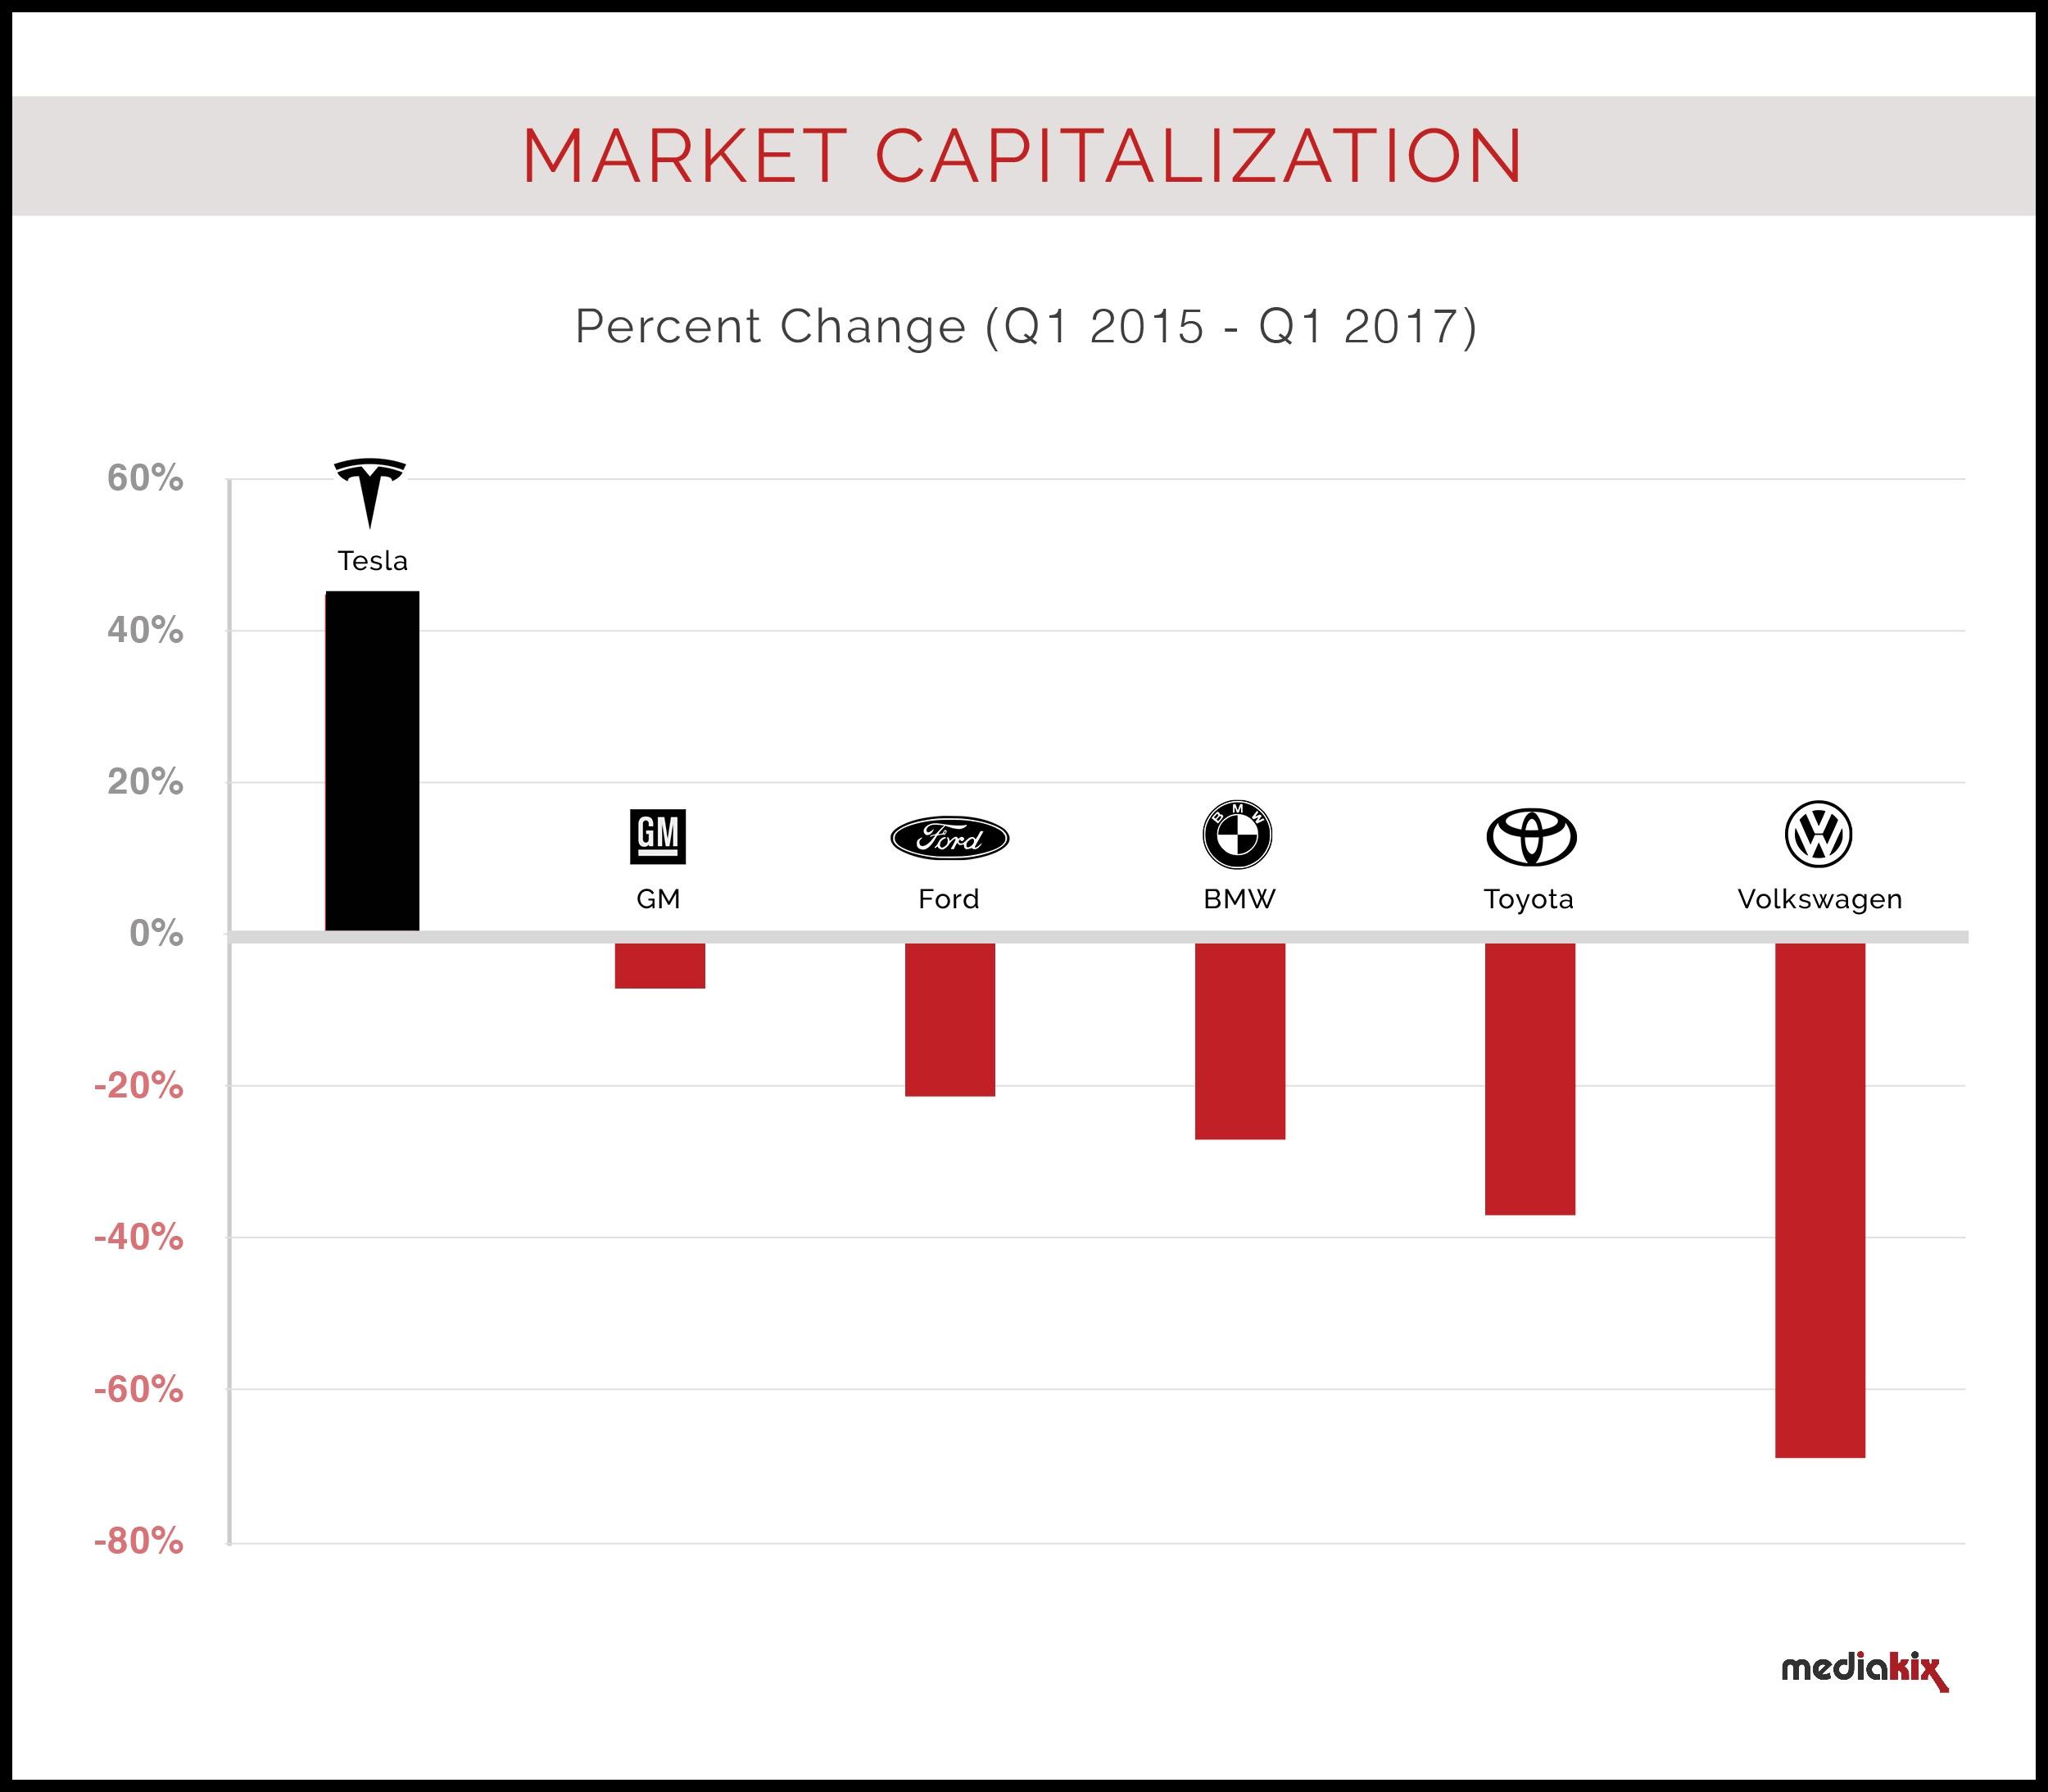 Tesla Market Capitalization Percent Change